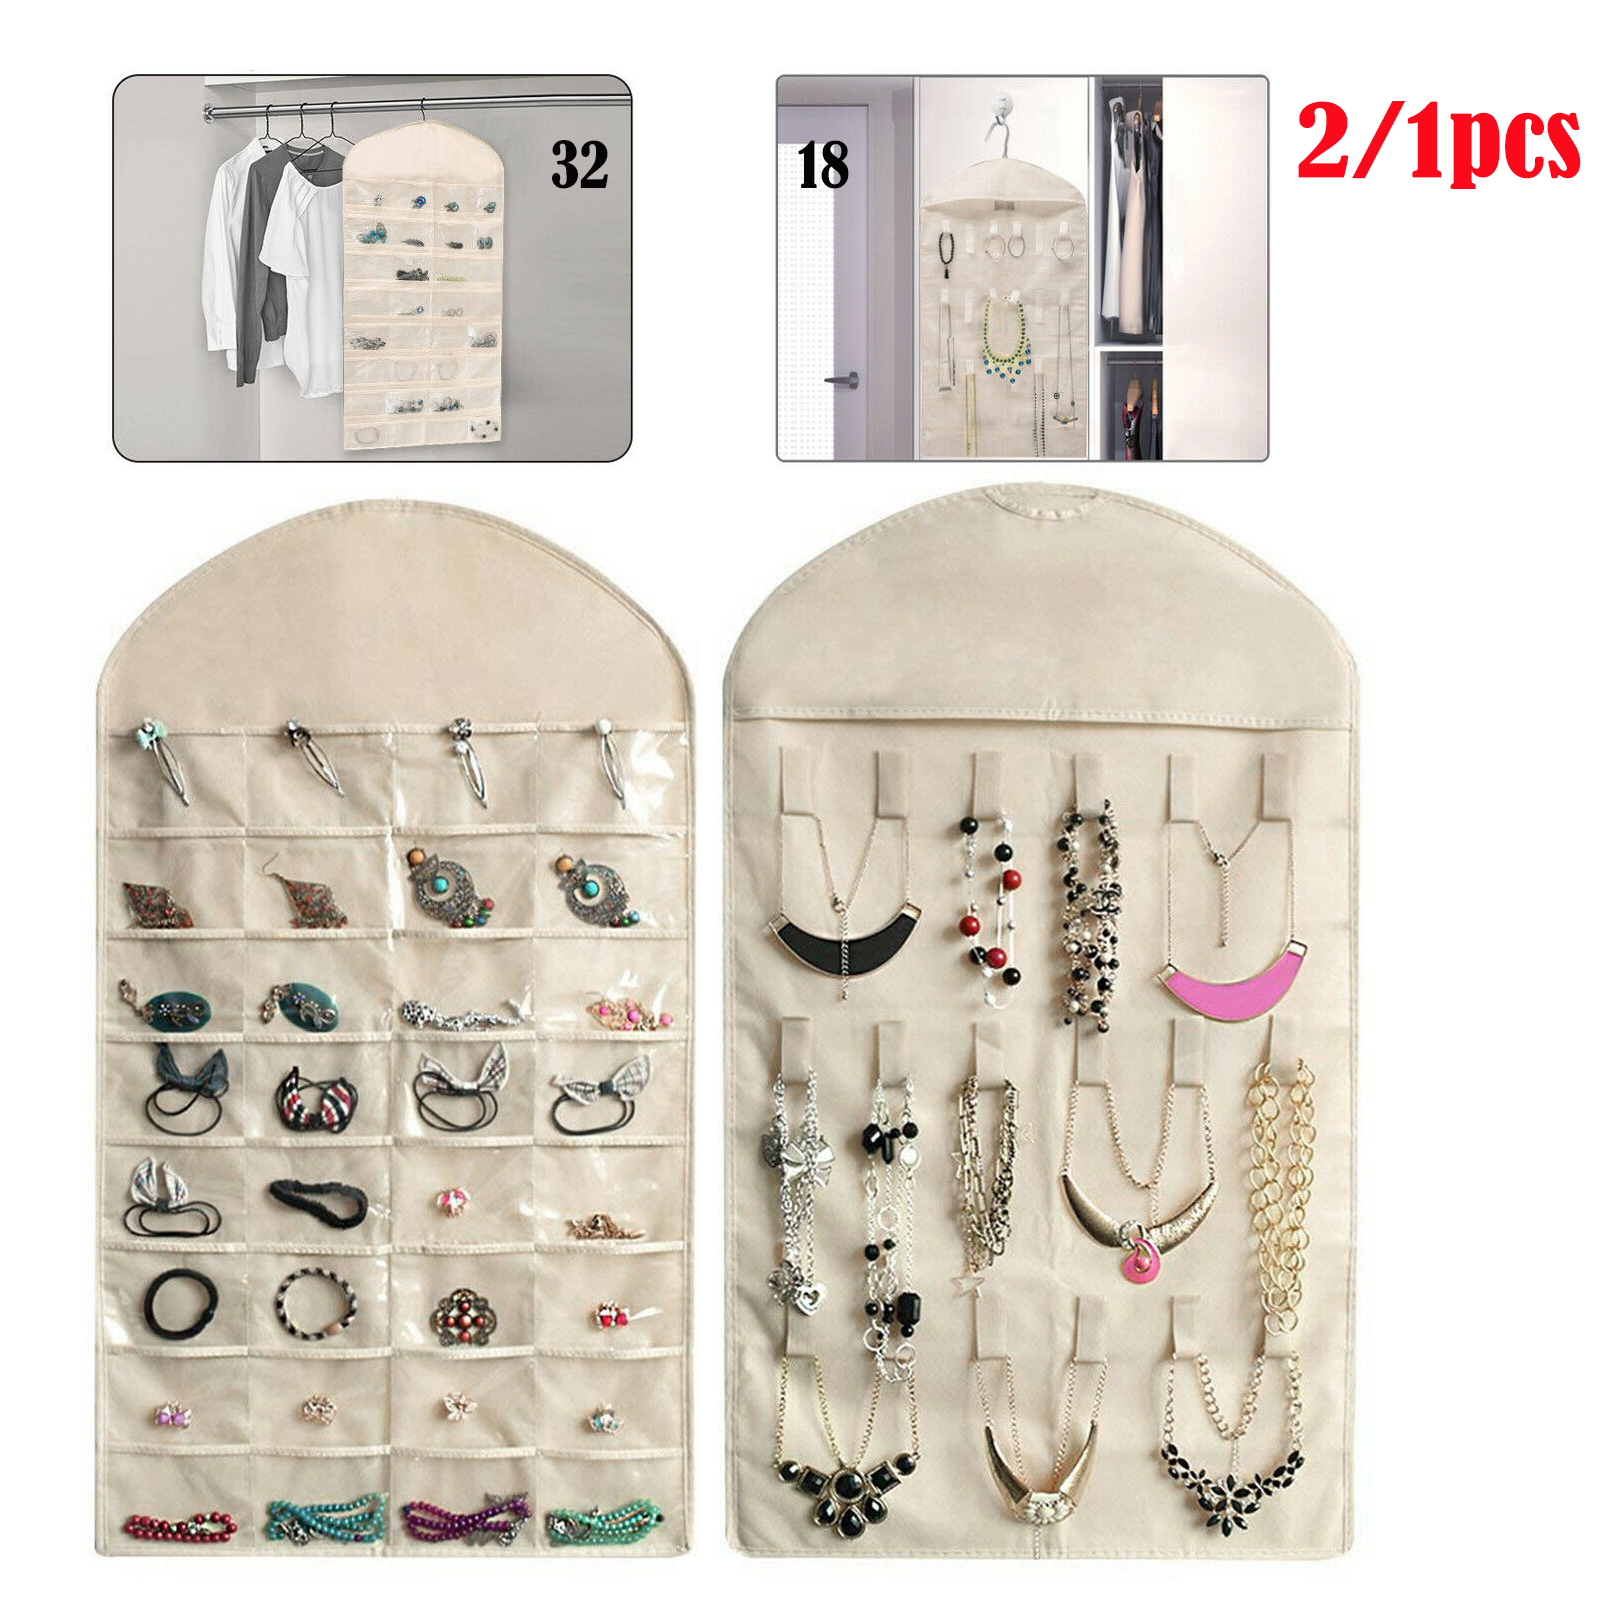 EEEkit - 2/1Pcs Closet Hanging Jewelry Organizer Necklace ...